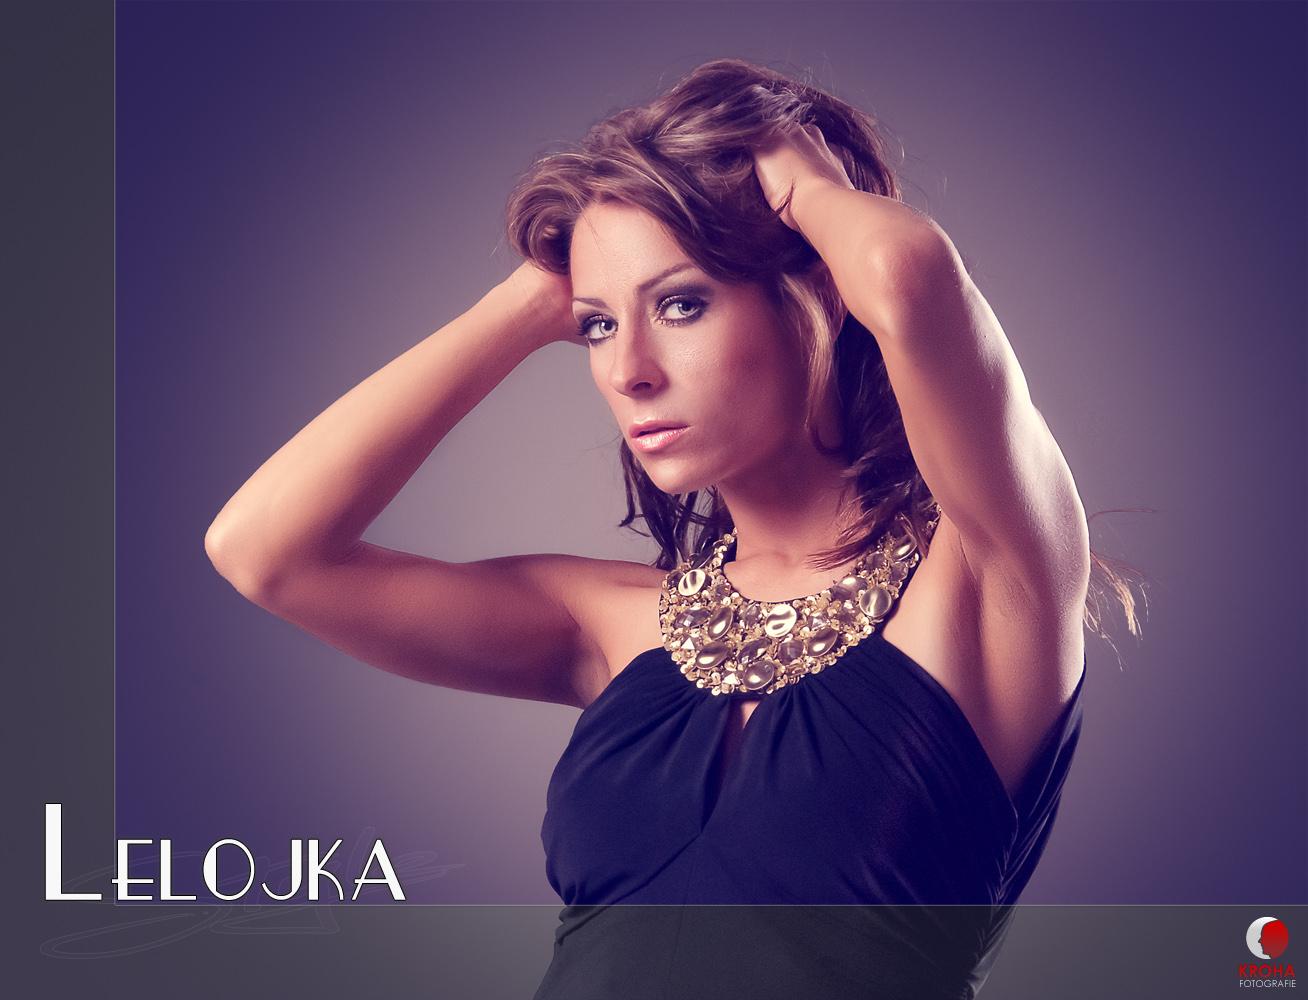 Lelojka Portrait